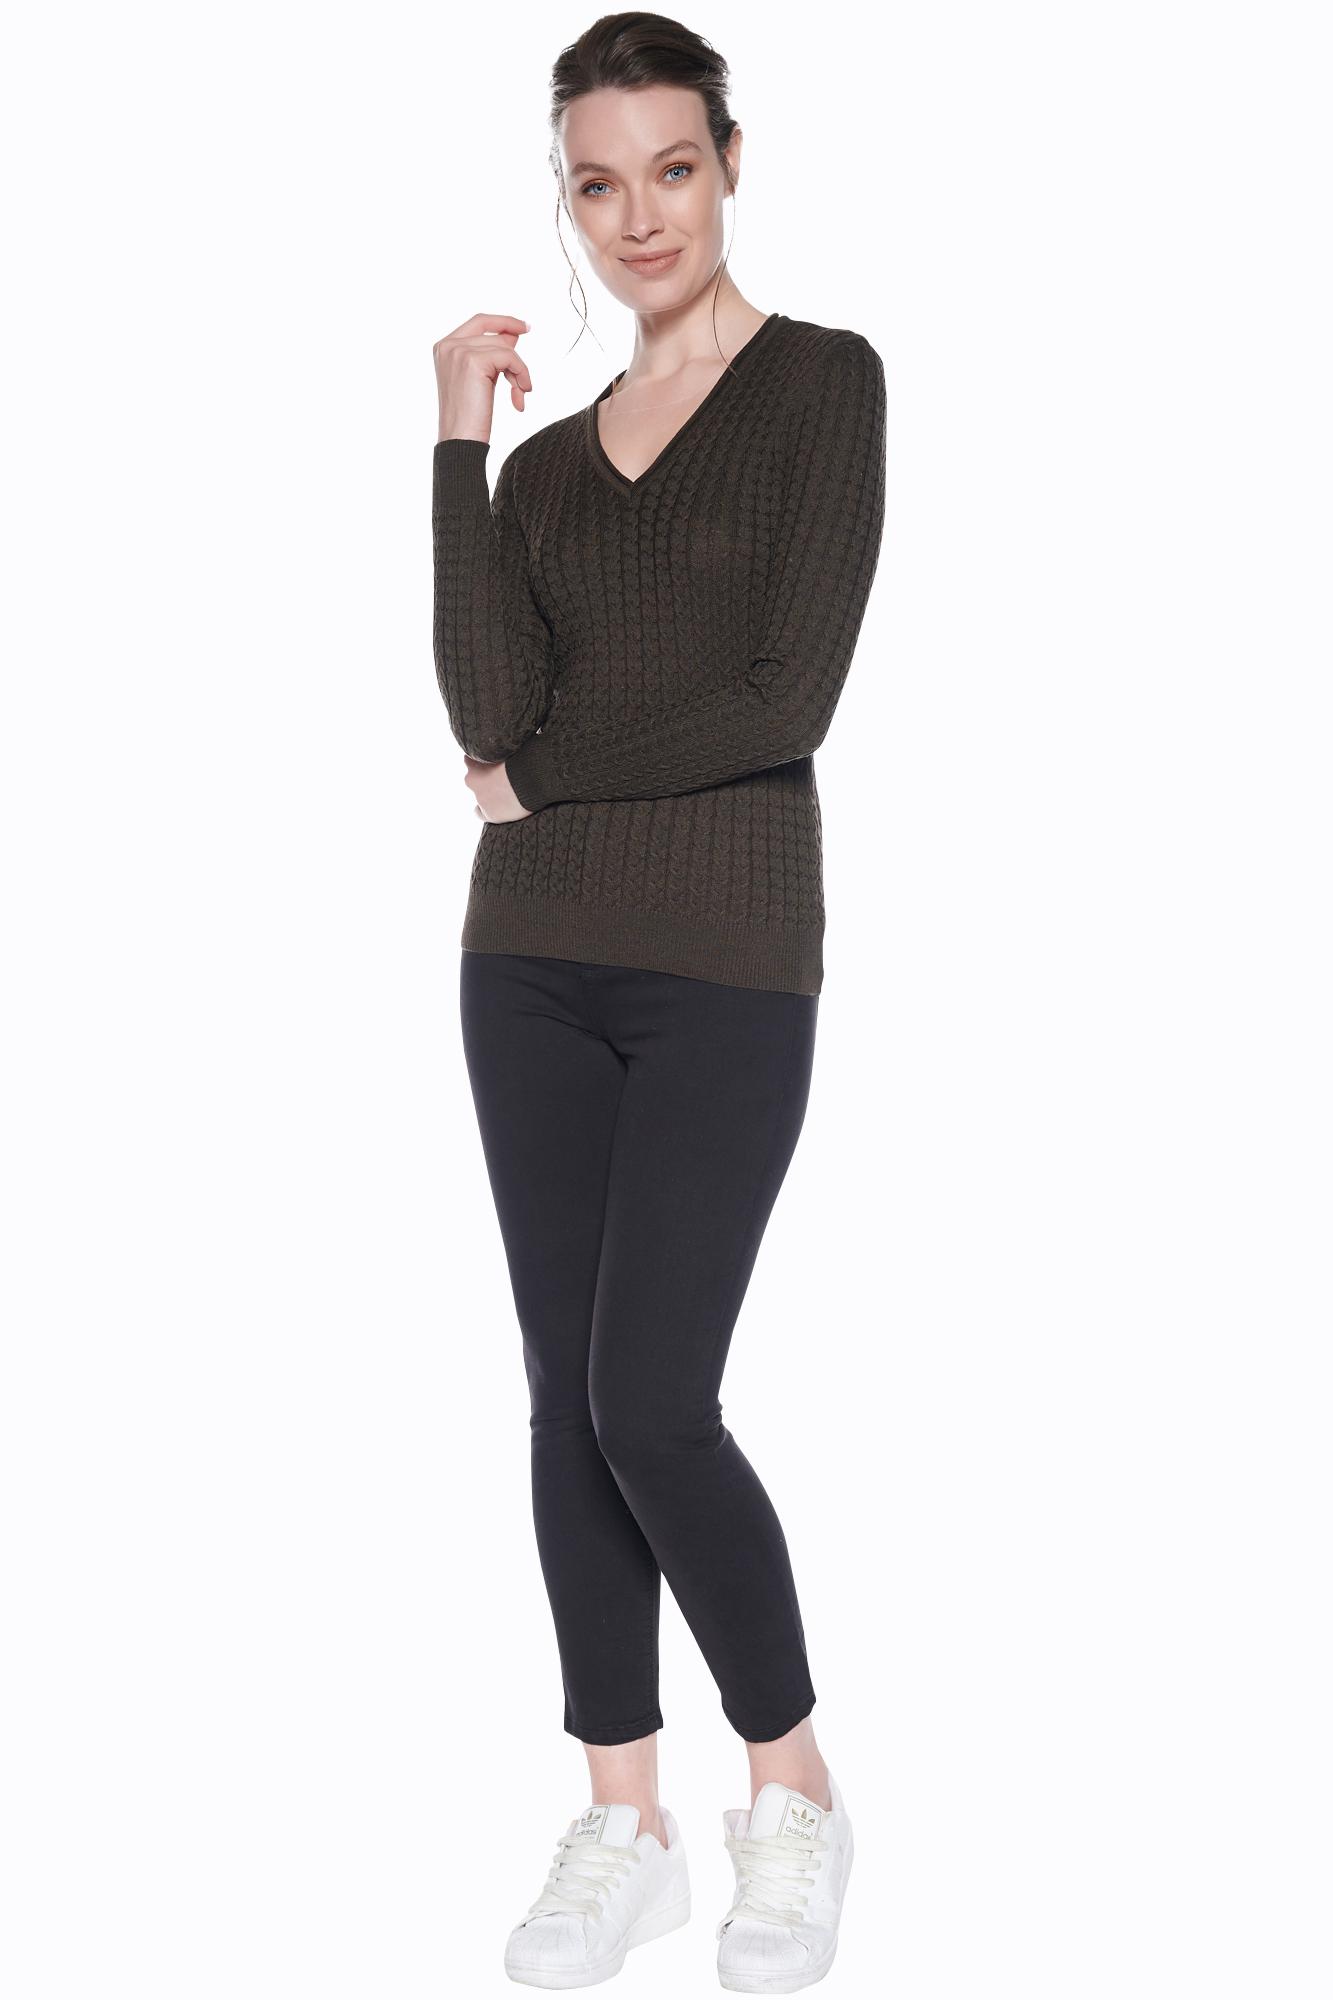 Vestino Damen V-Neck Pullover Zopfmuster Lange Ärmel Strickpullover Strick Pulli